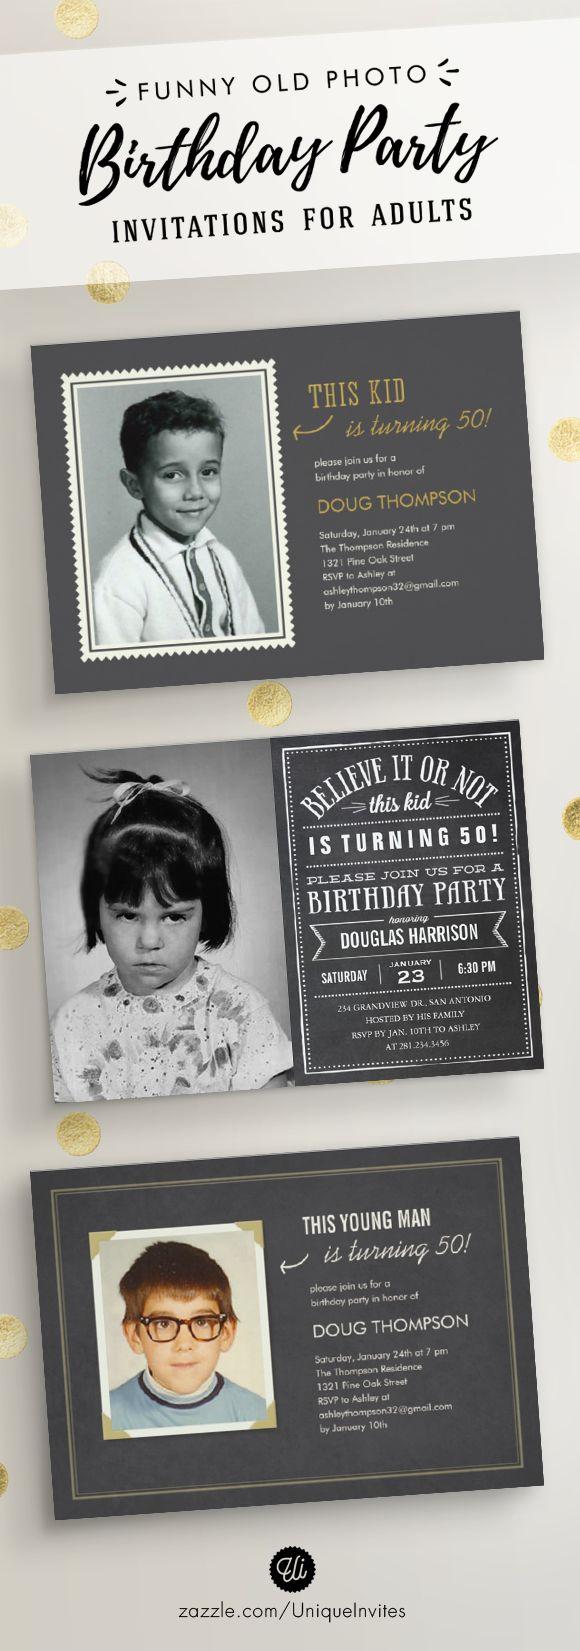 Best 25 Birthday invitations ideas on Pinterest Birthday party